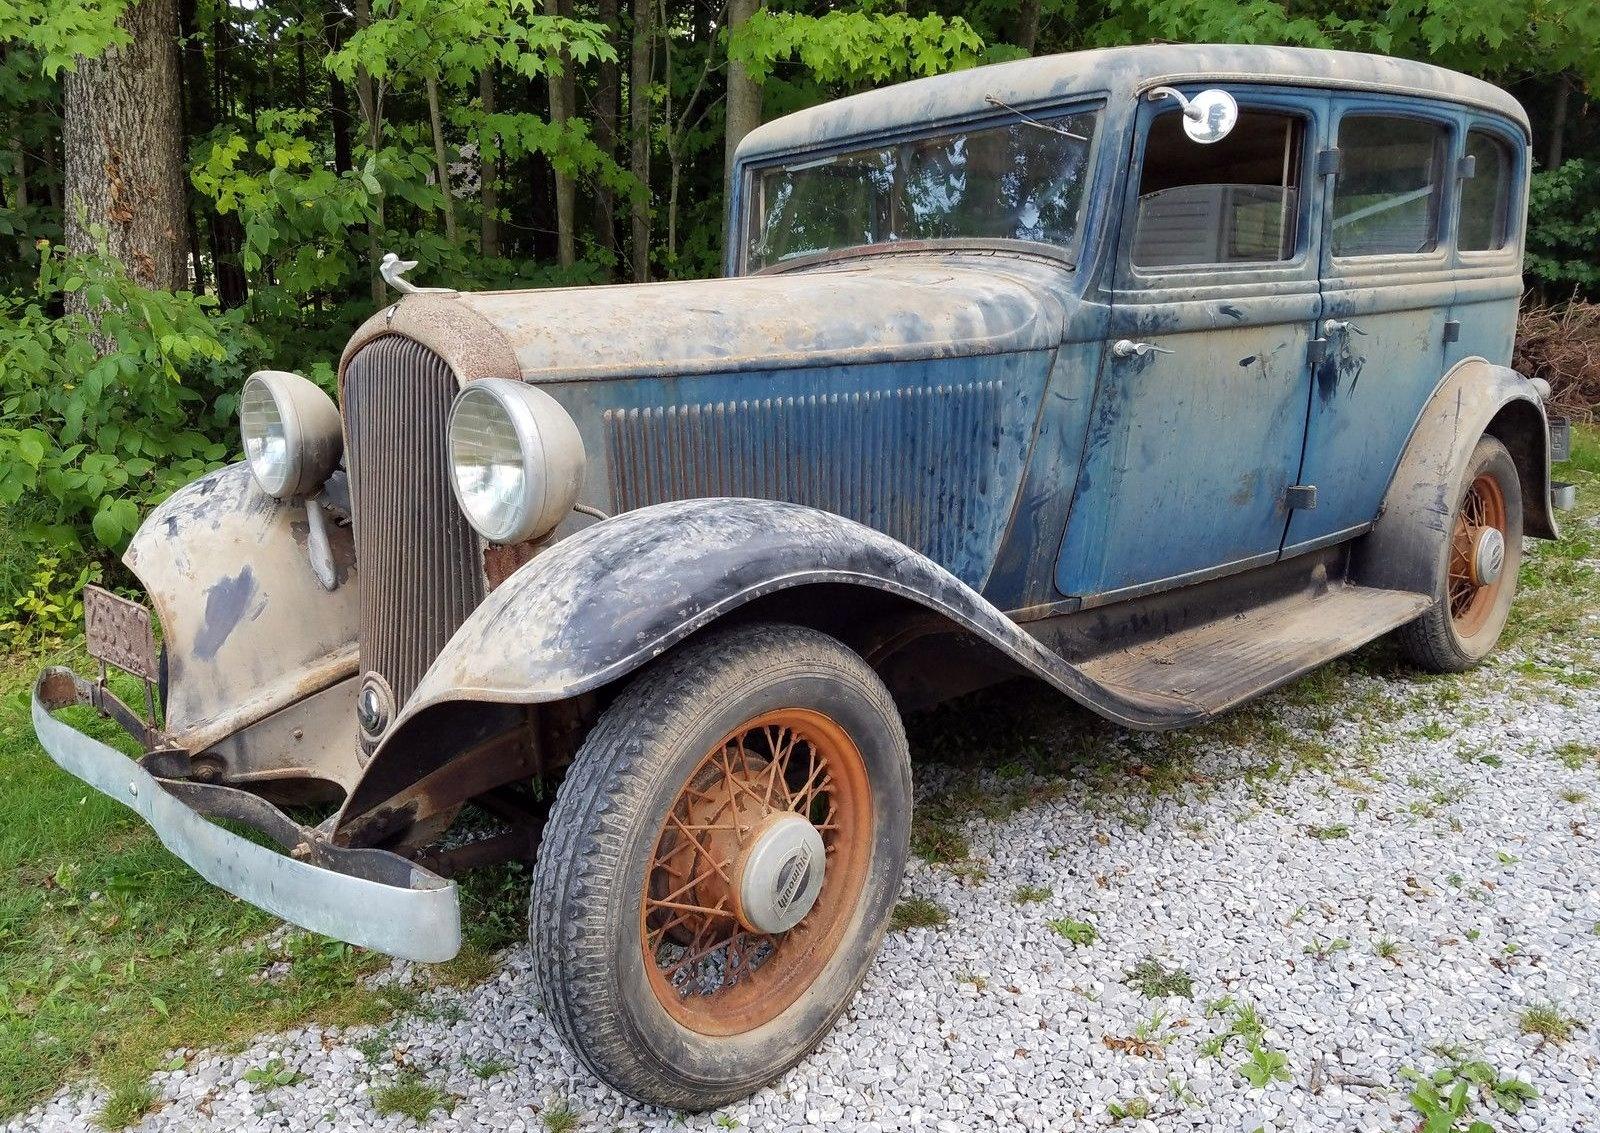 84 Years Original: 1932 Plymouth